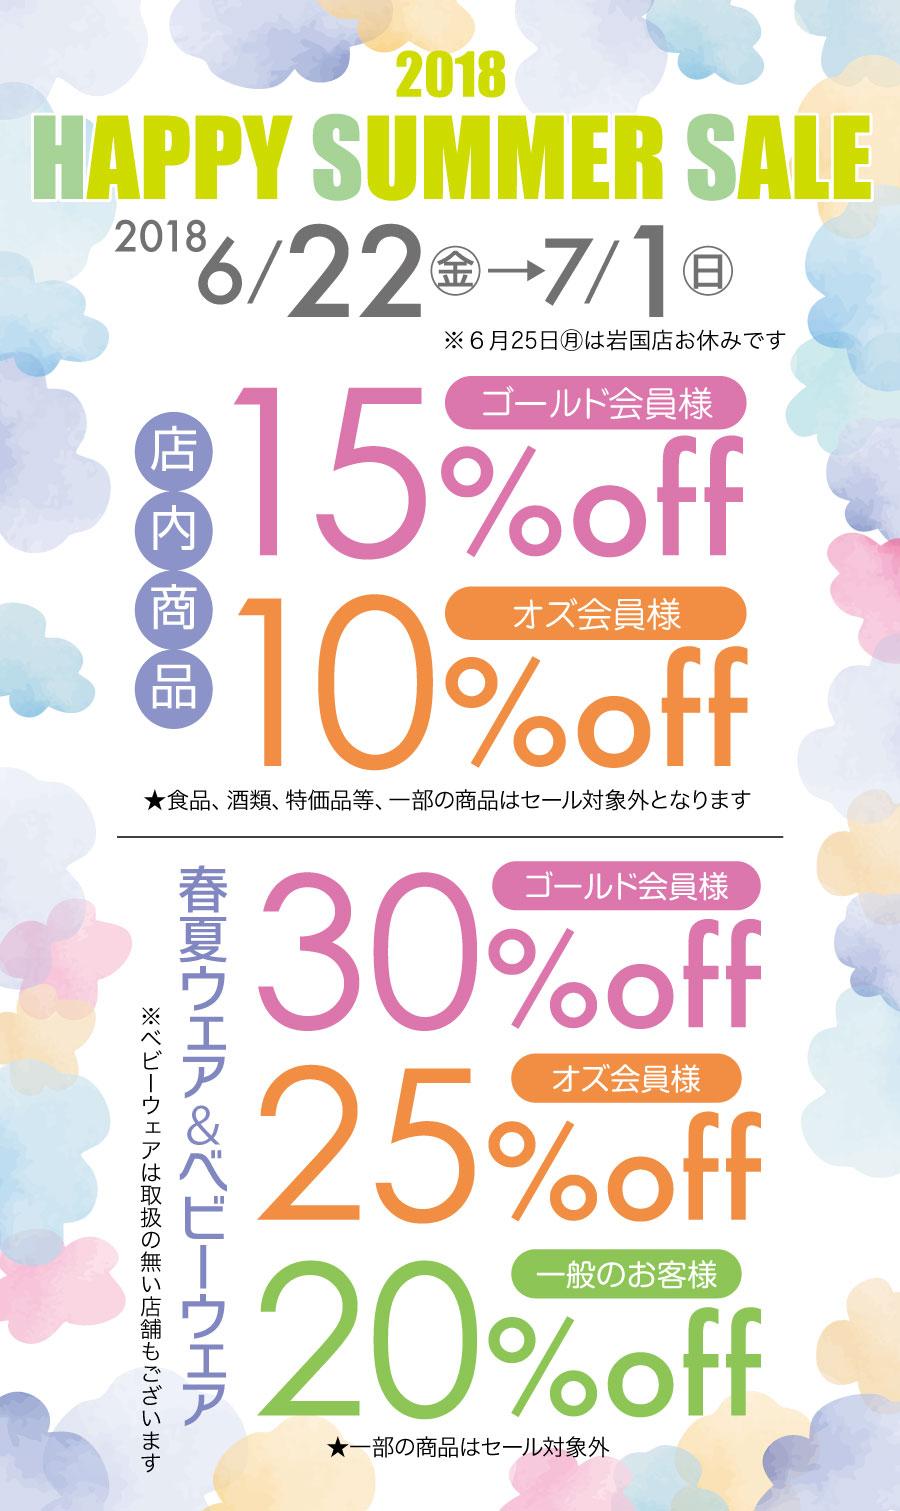 2018 Happy Summer Sale